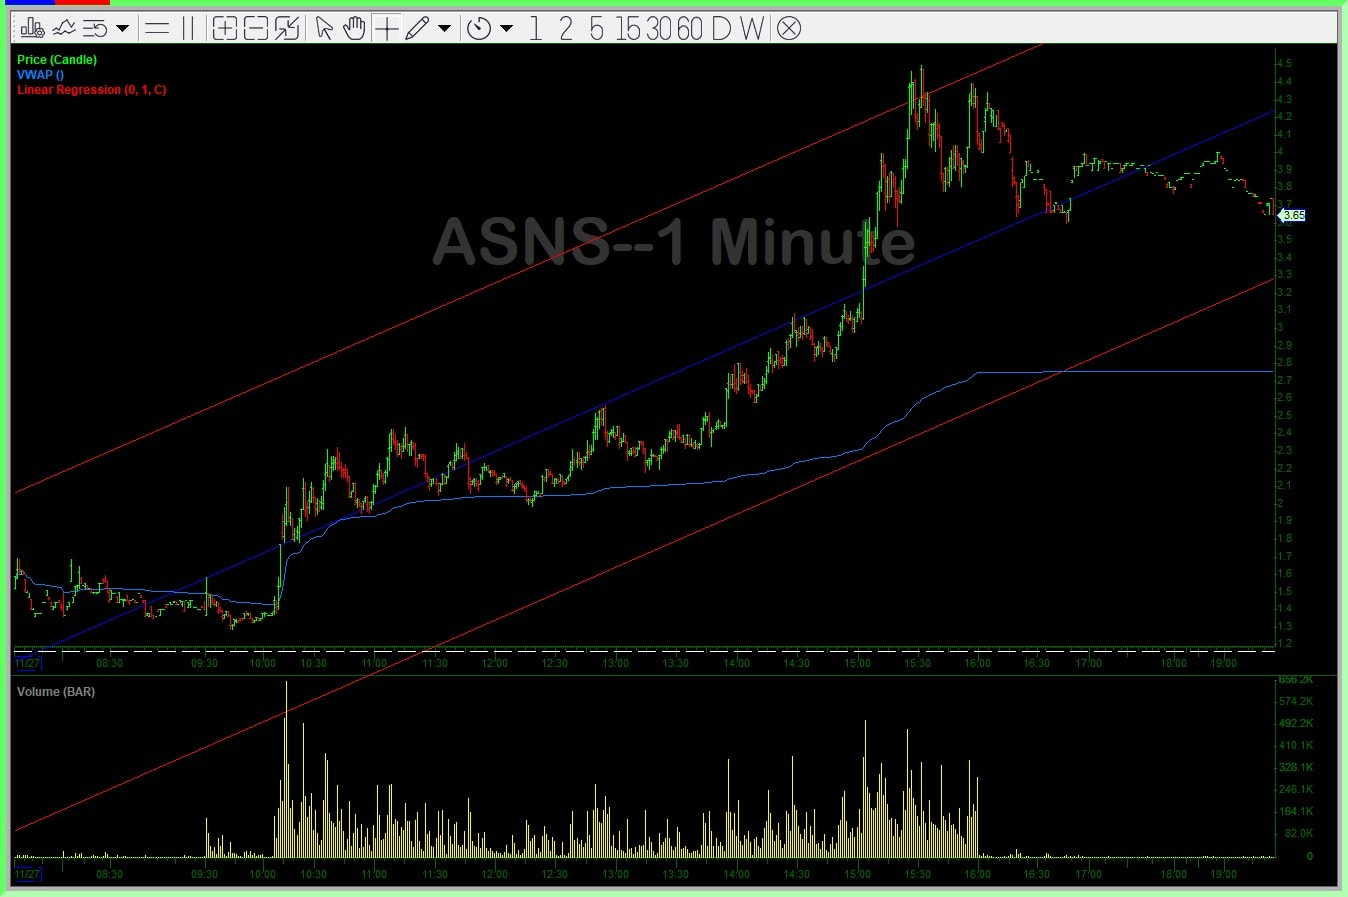 ASNS Chart